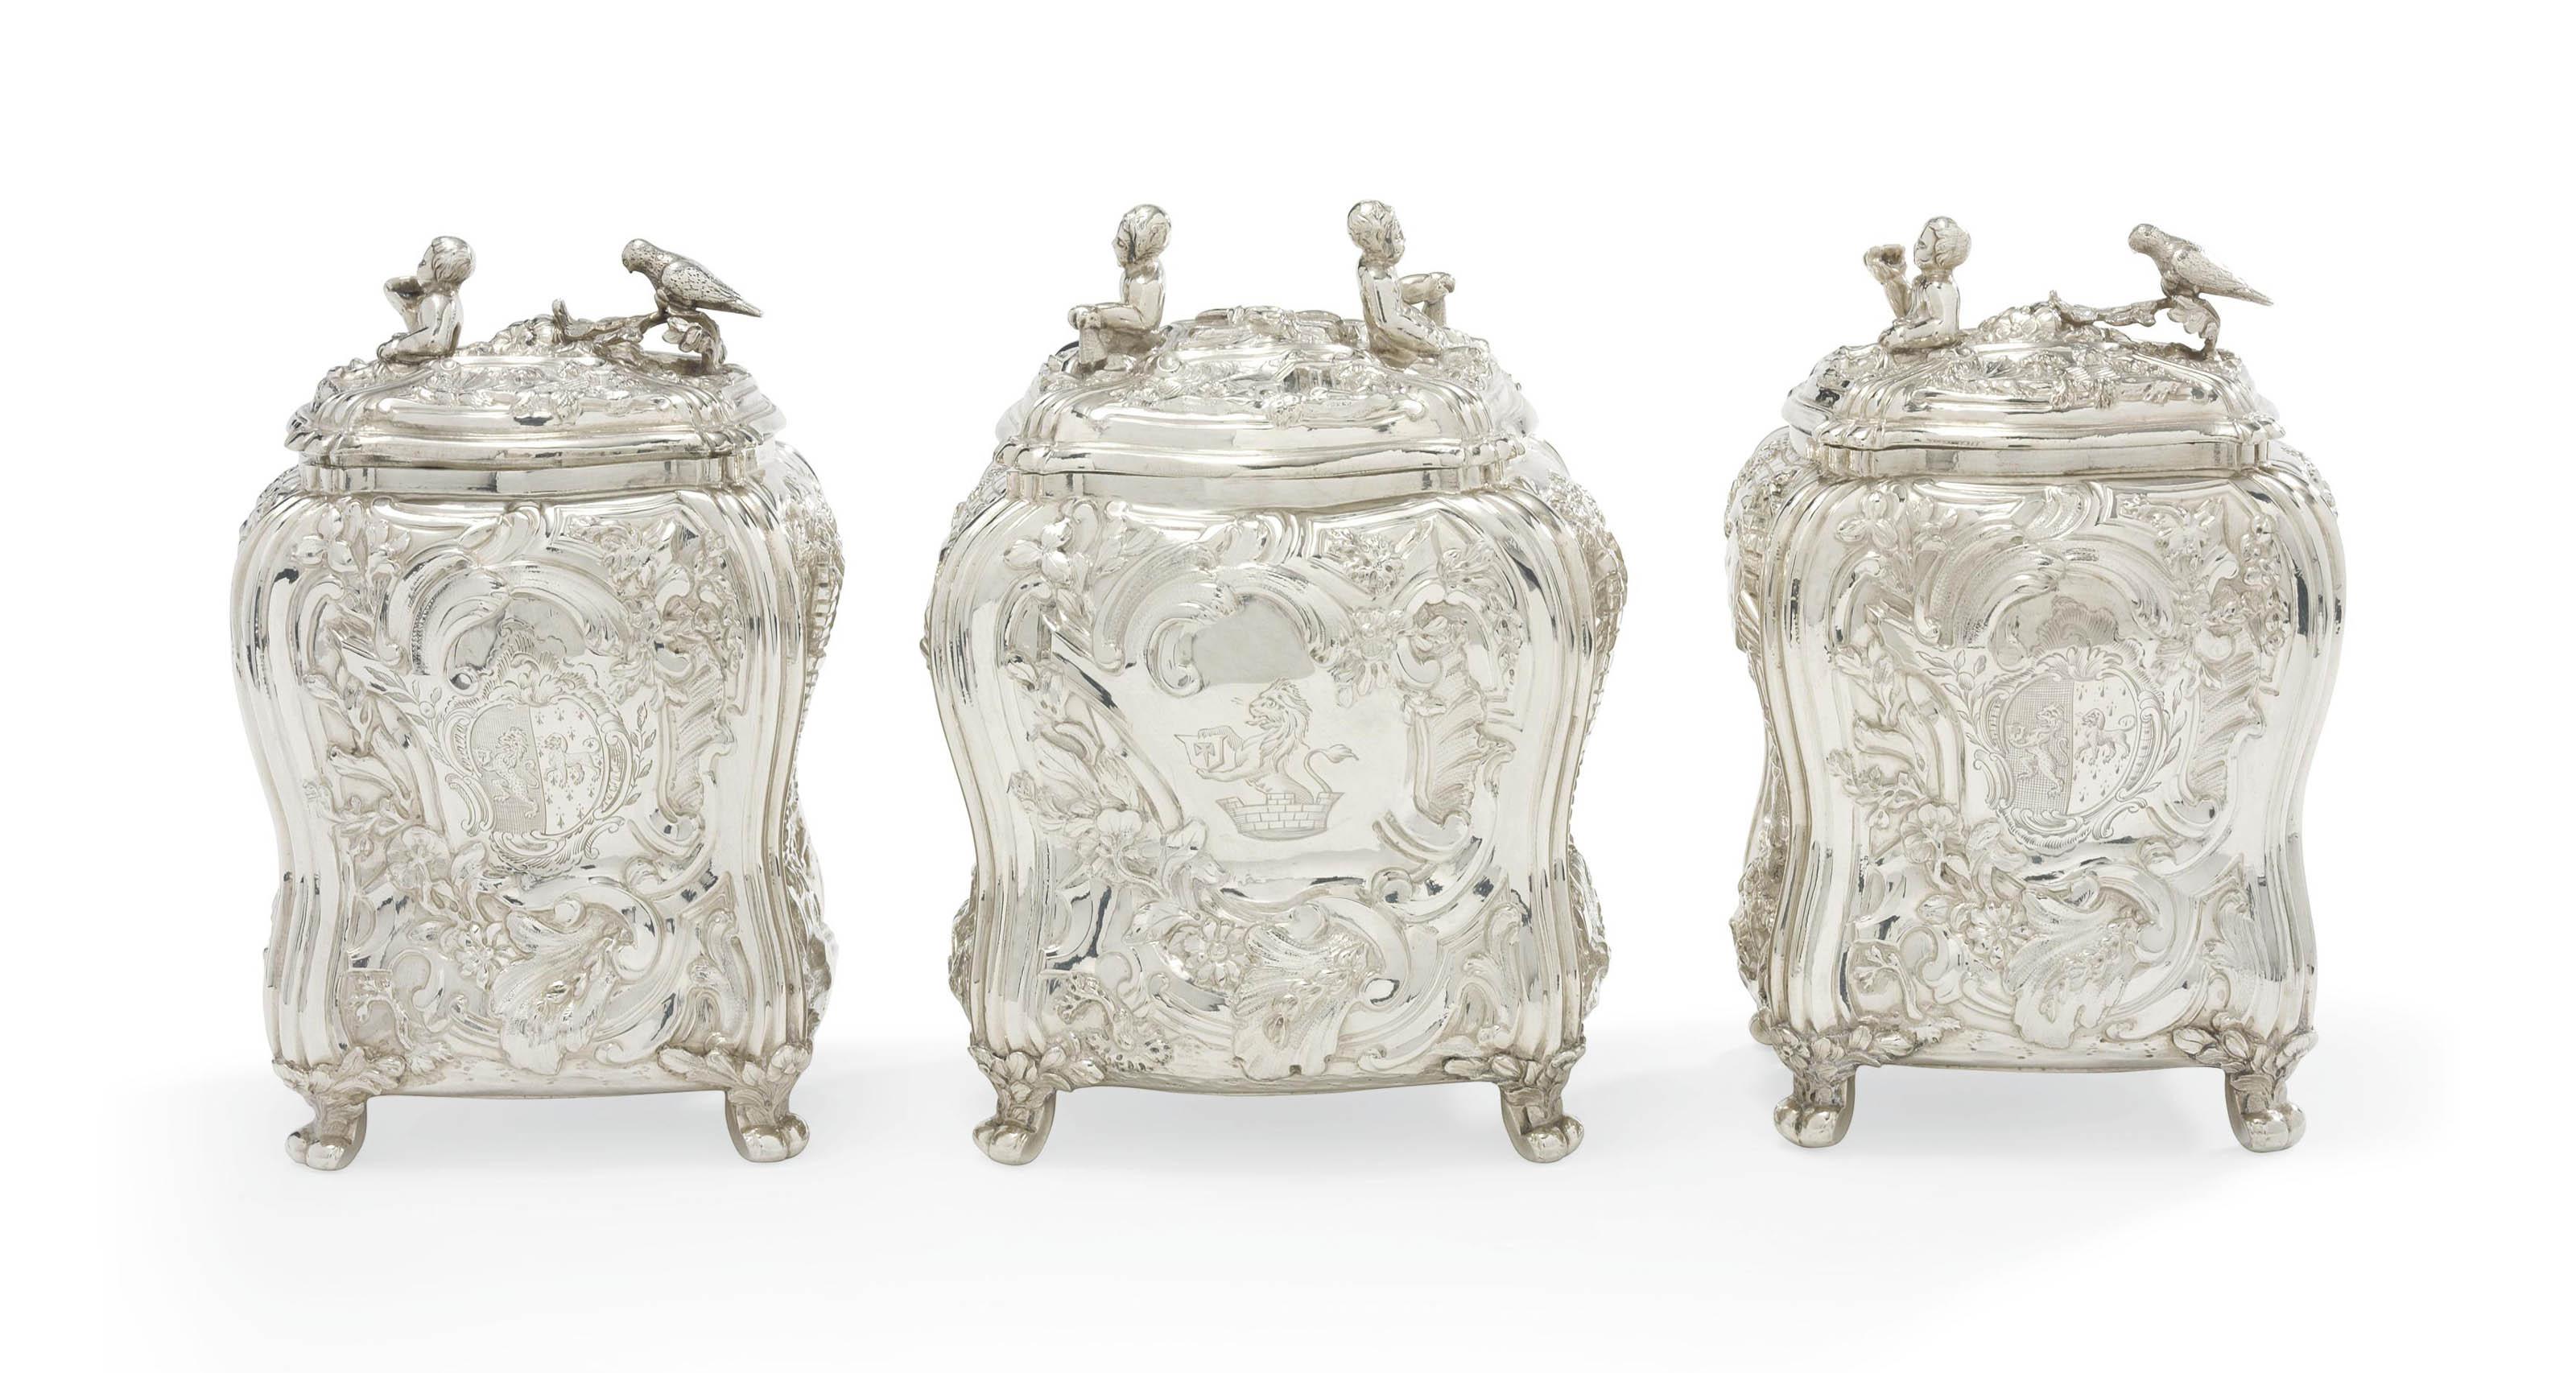 A PAIR OF GEORGE II SILVER TEA-CADDIES AND A SUGAR-BOX EN-SUITE